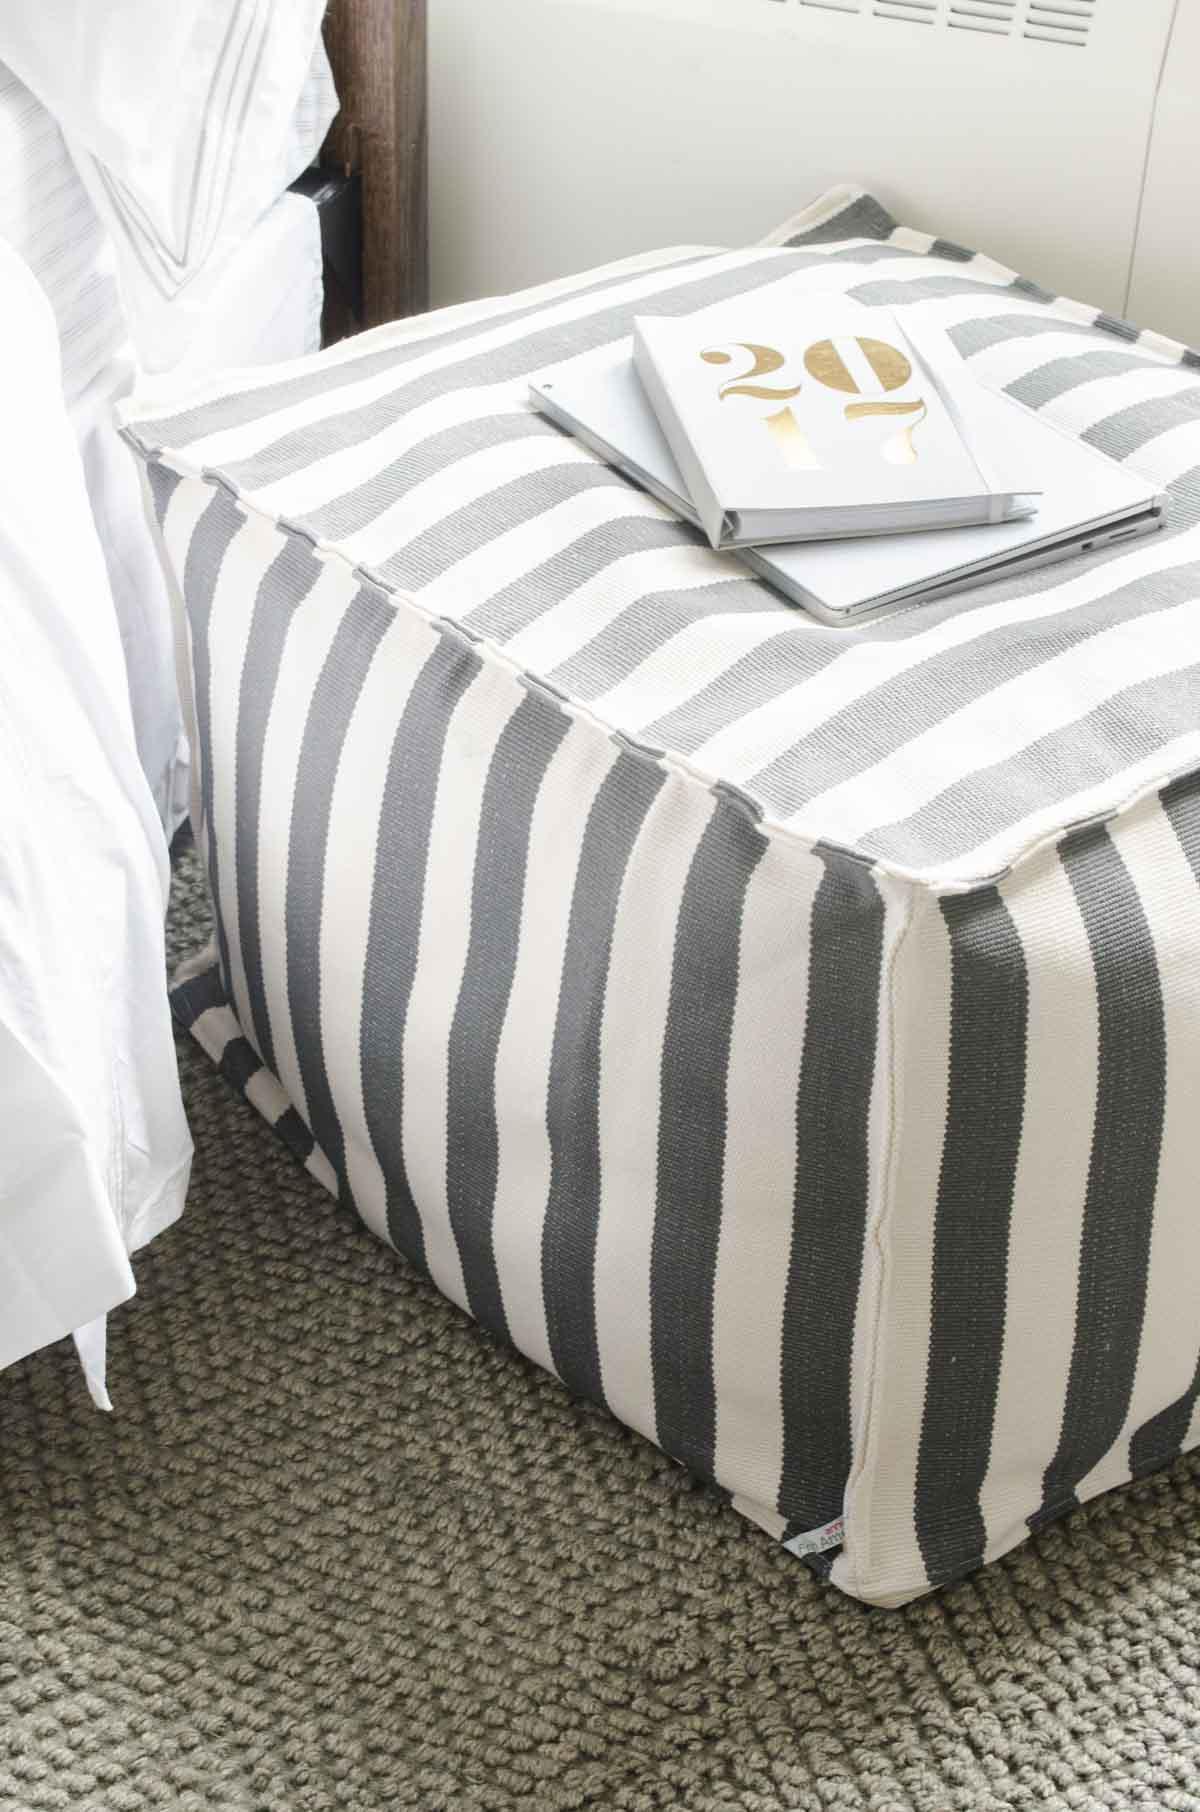 Dorm room decor essentials with bedding, pouf, art prints via @thouswellblog